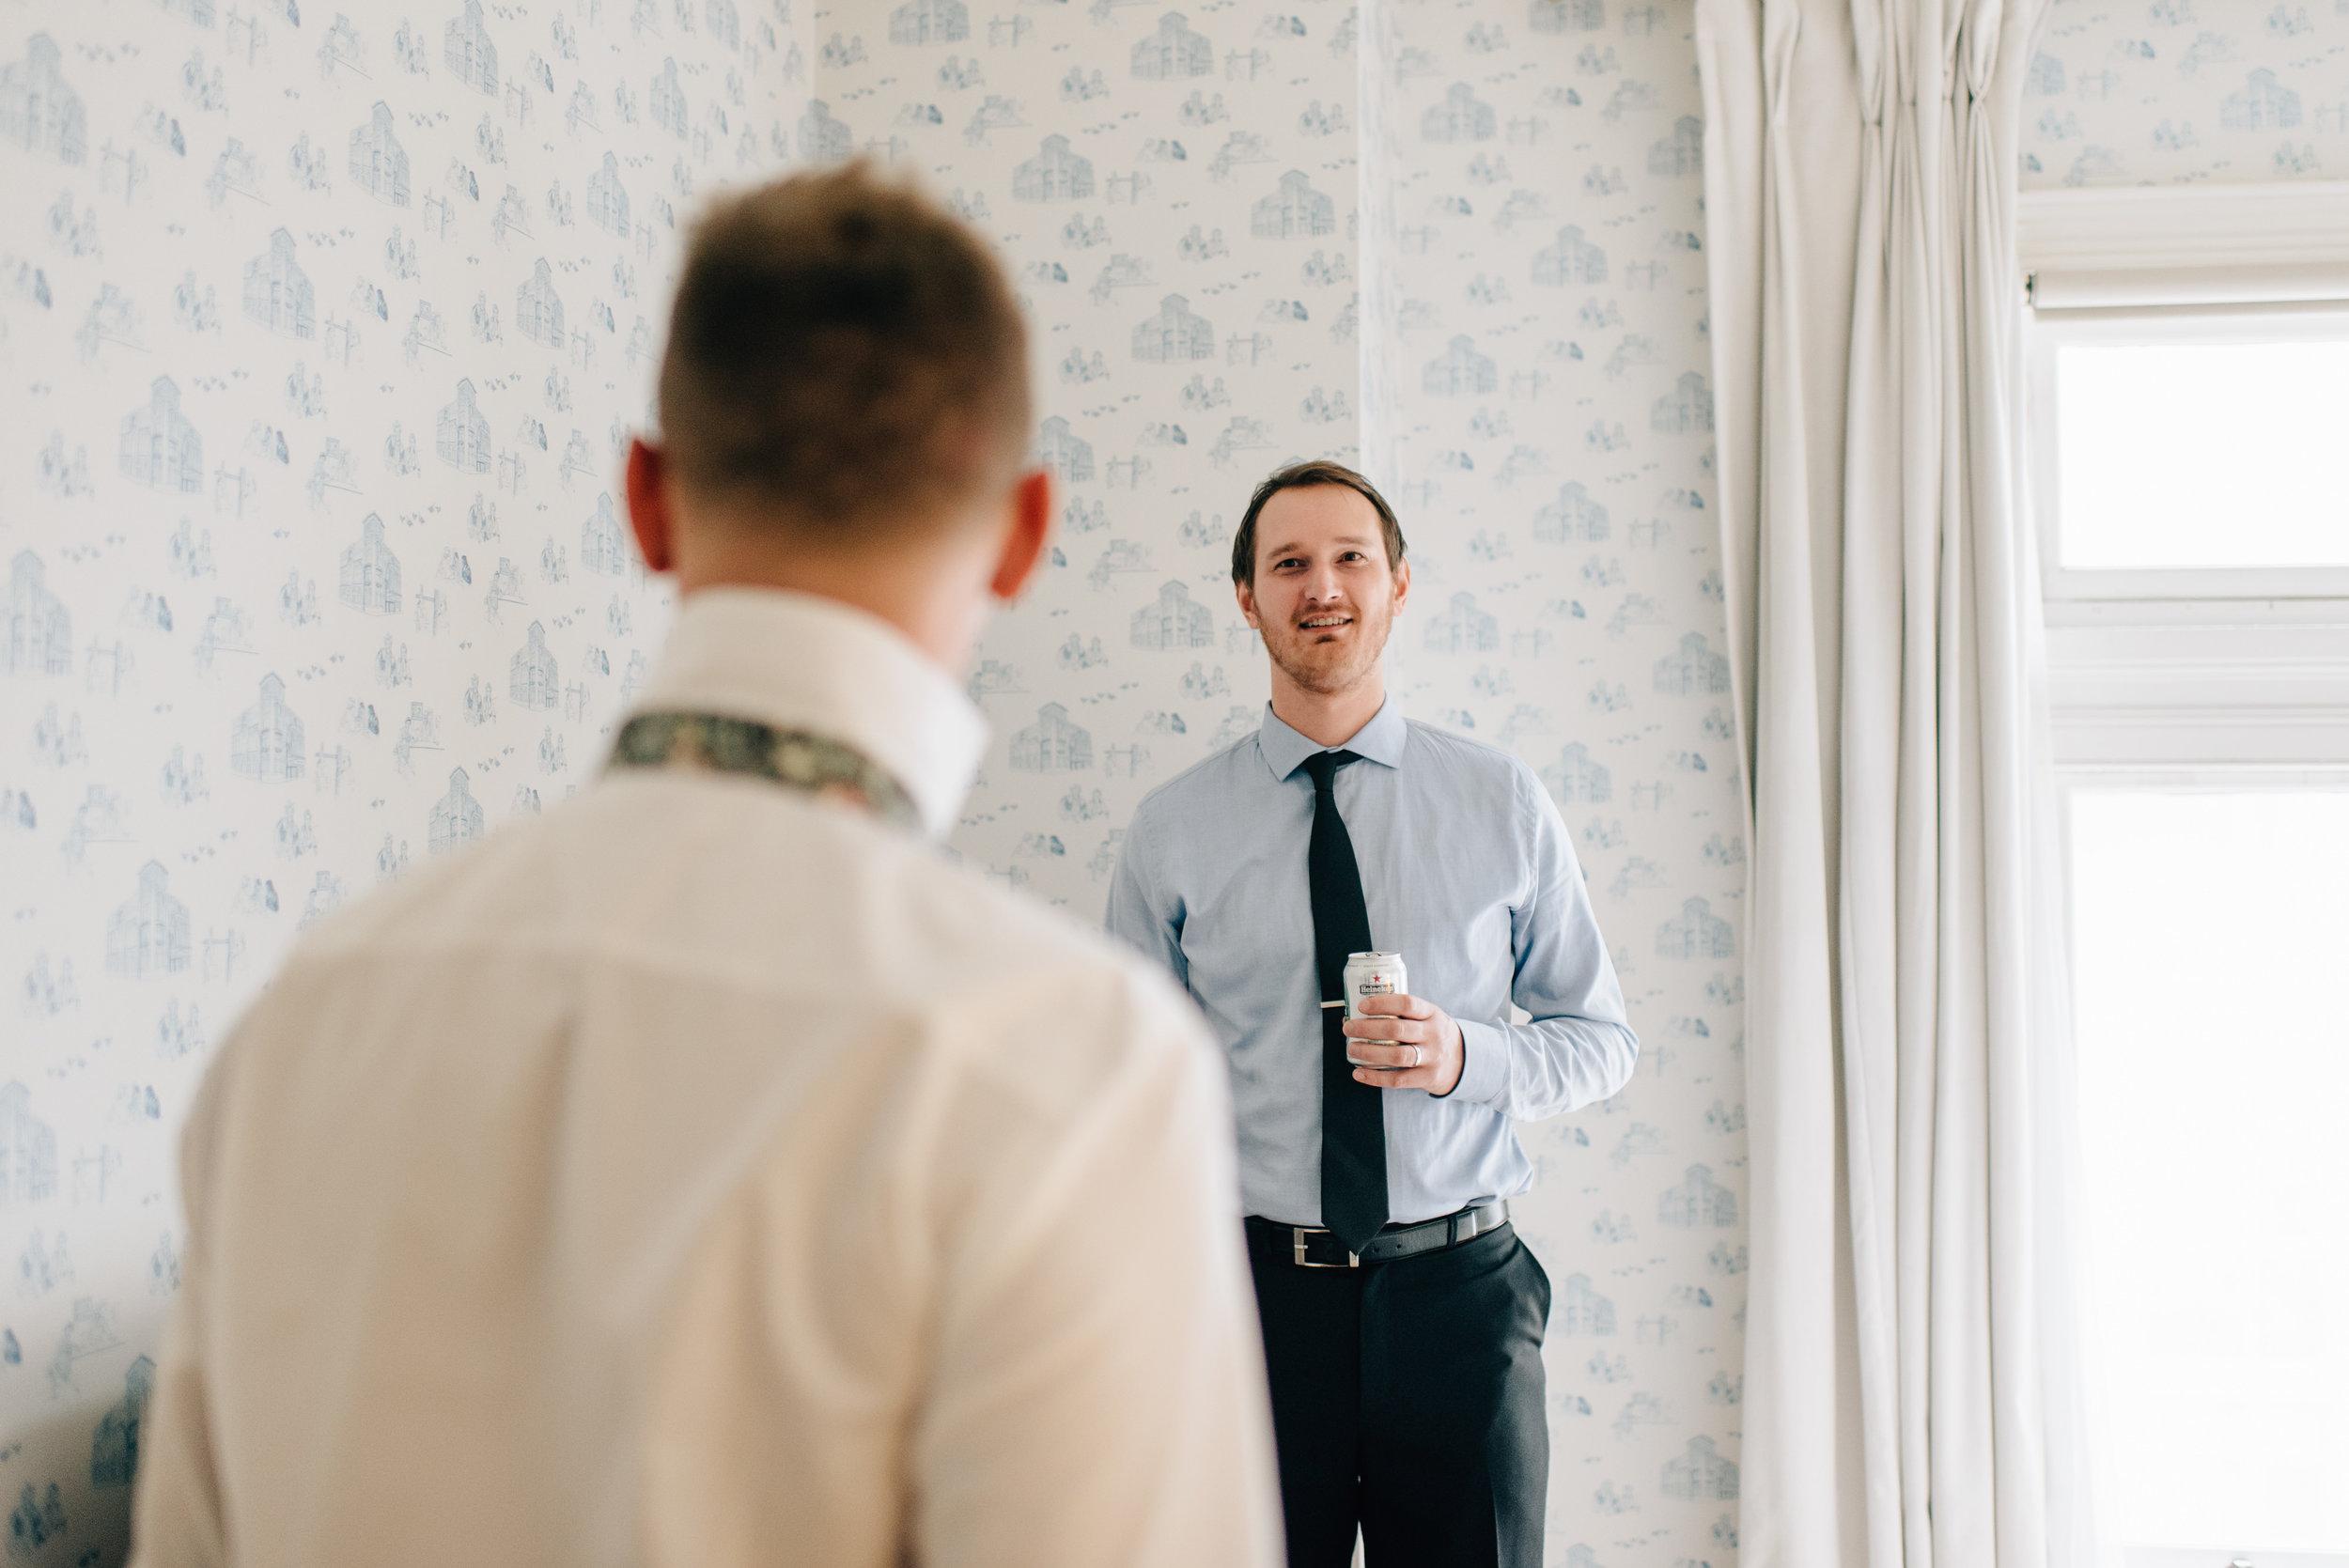 Intimate-Gladstone-Hotel-Wedding-9.jpg